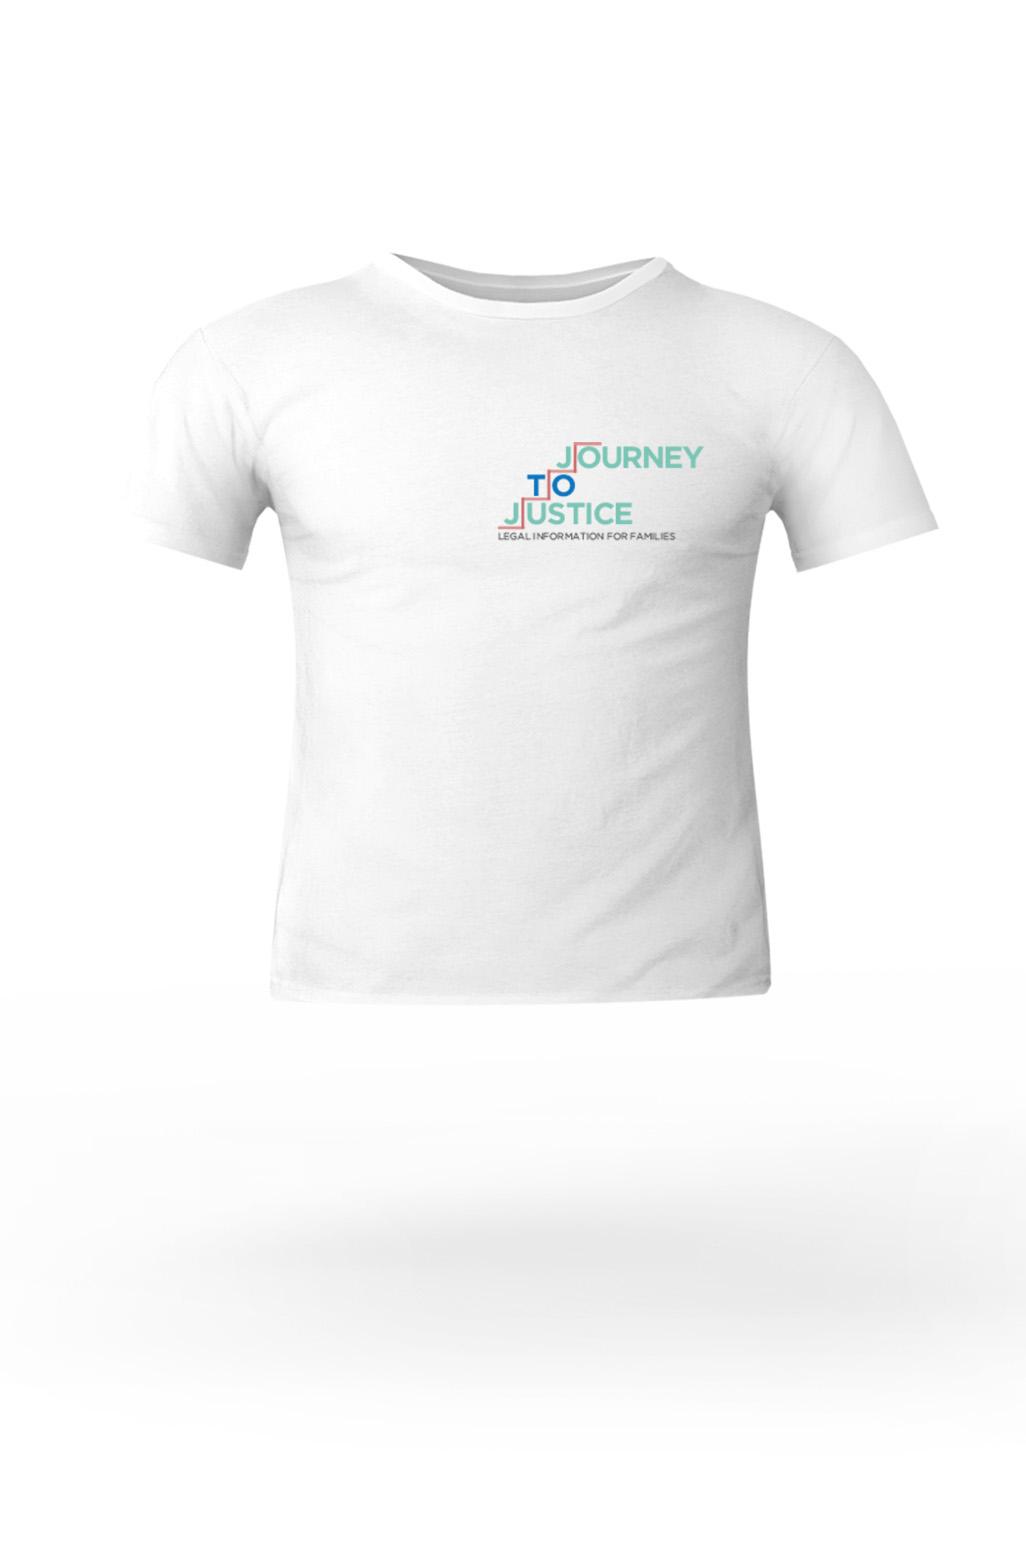 t-shirt_1.jpg